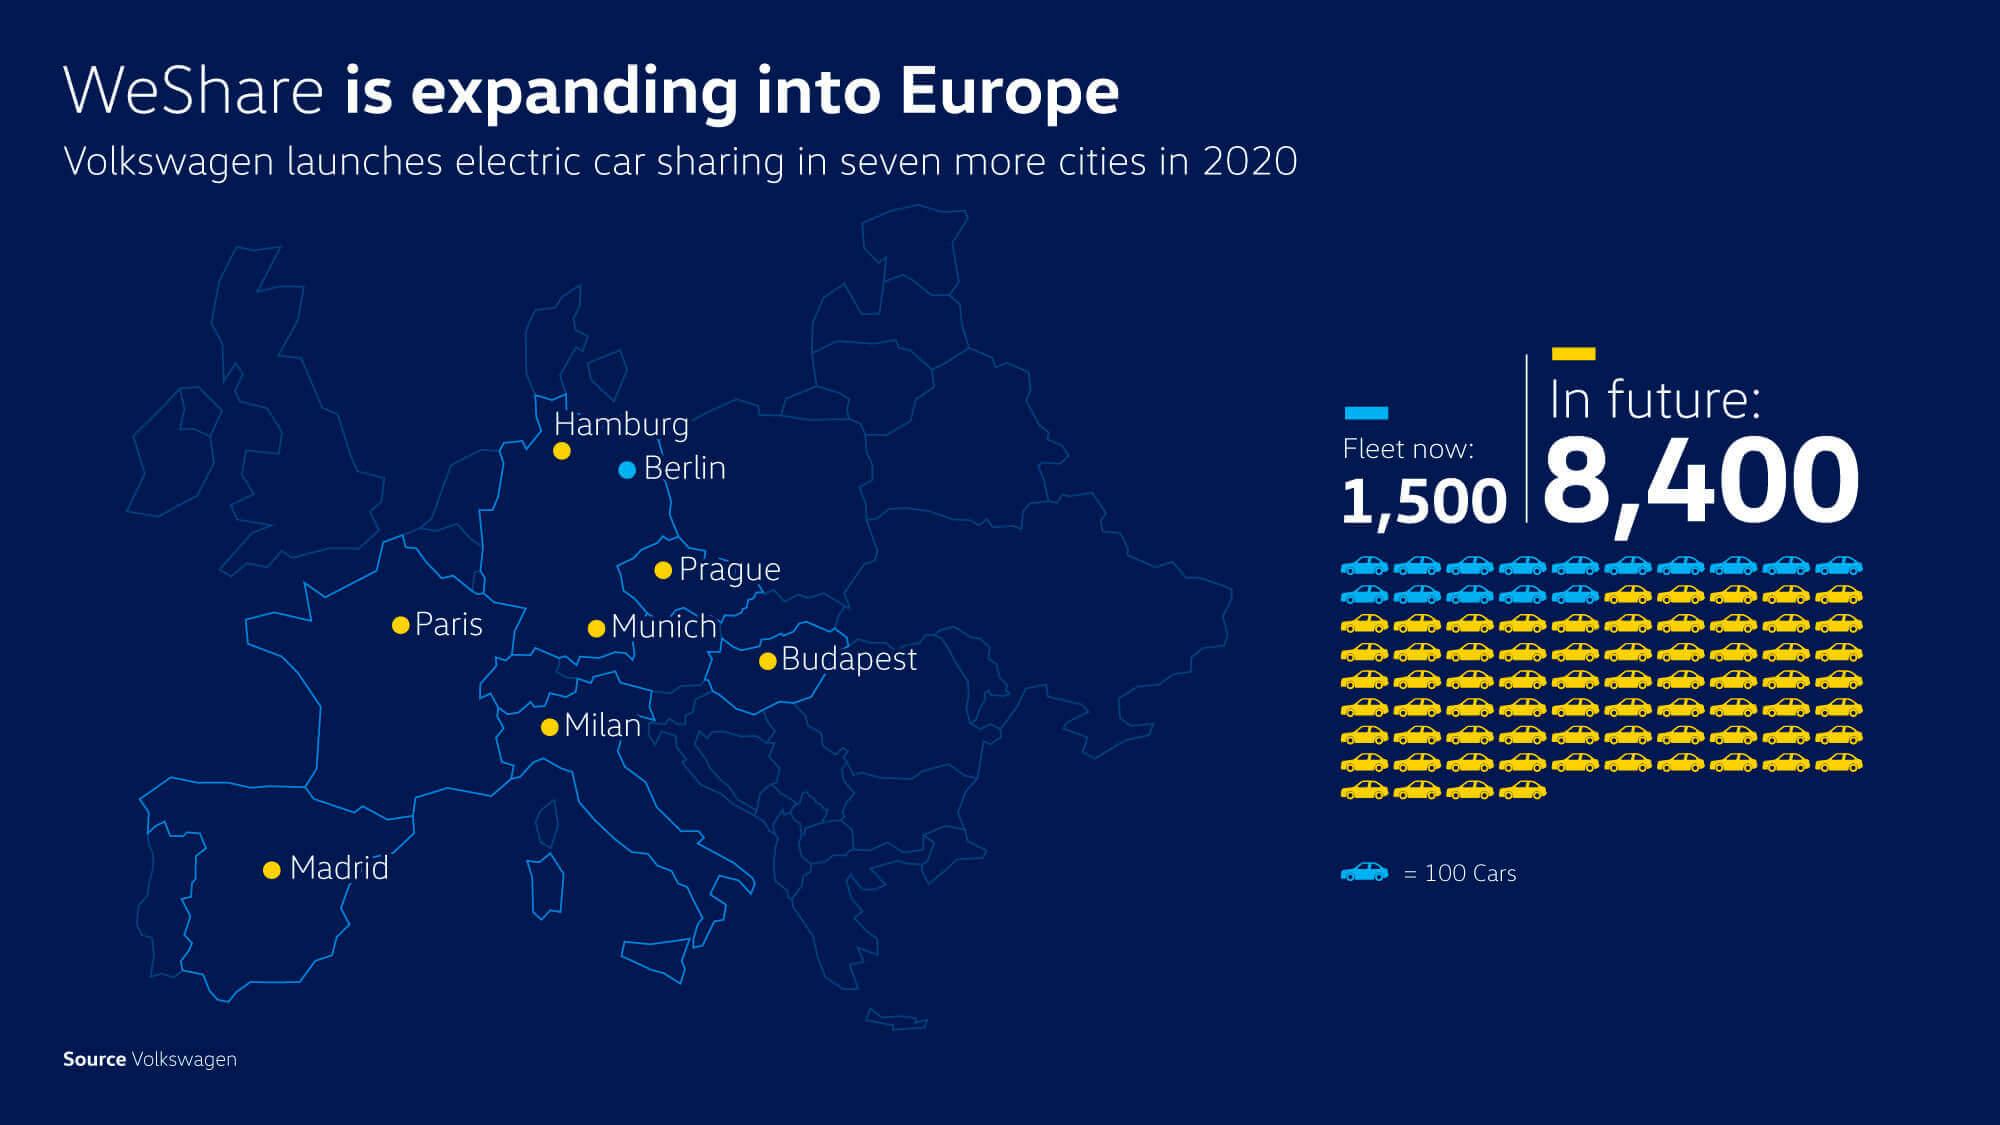 VW увеличит парк каршерингового сервиса WeShare до 8 400 электромобилей